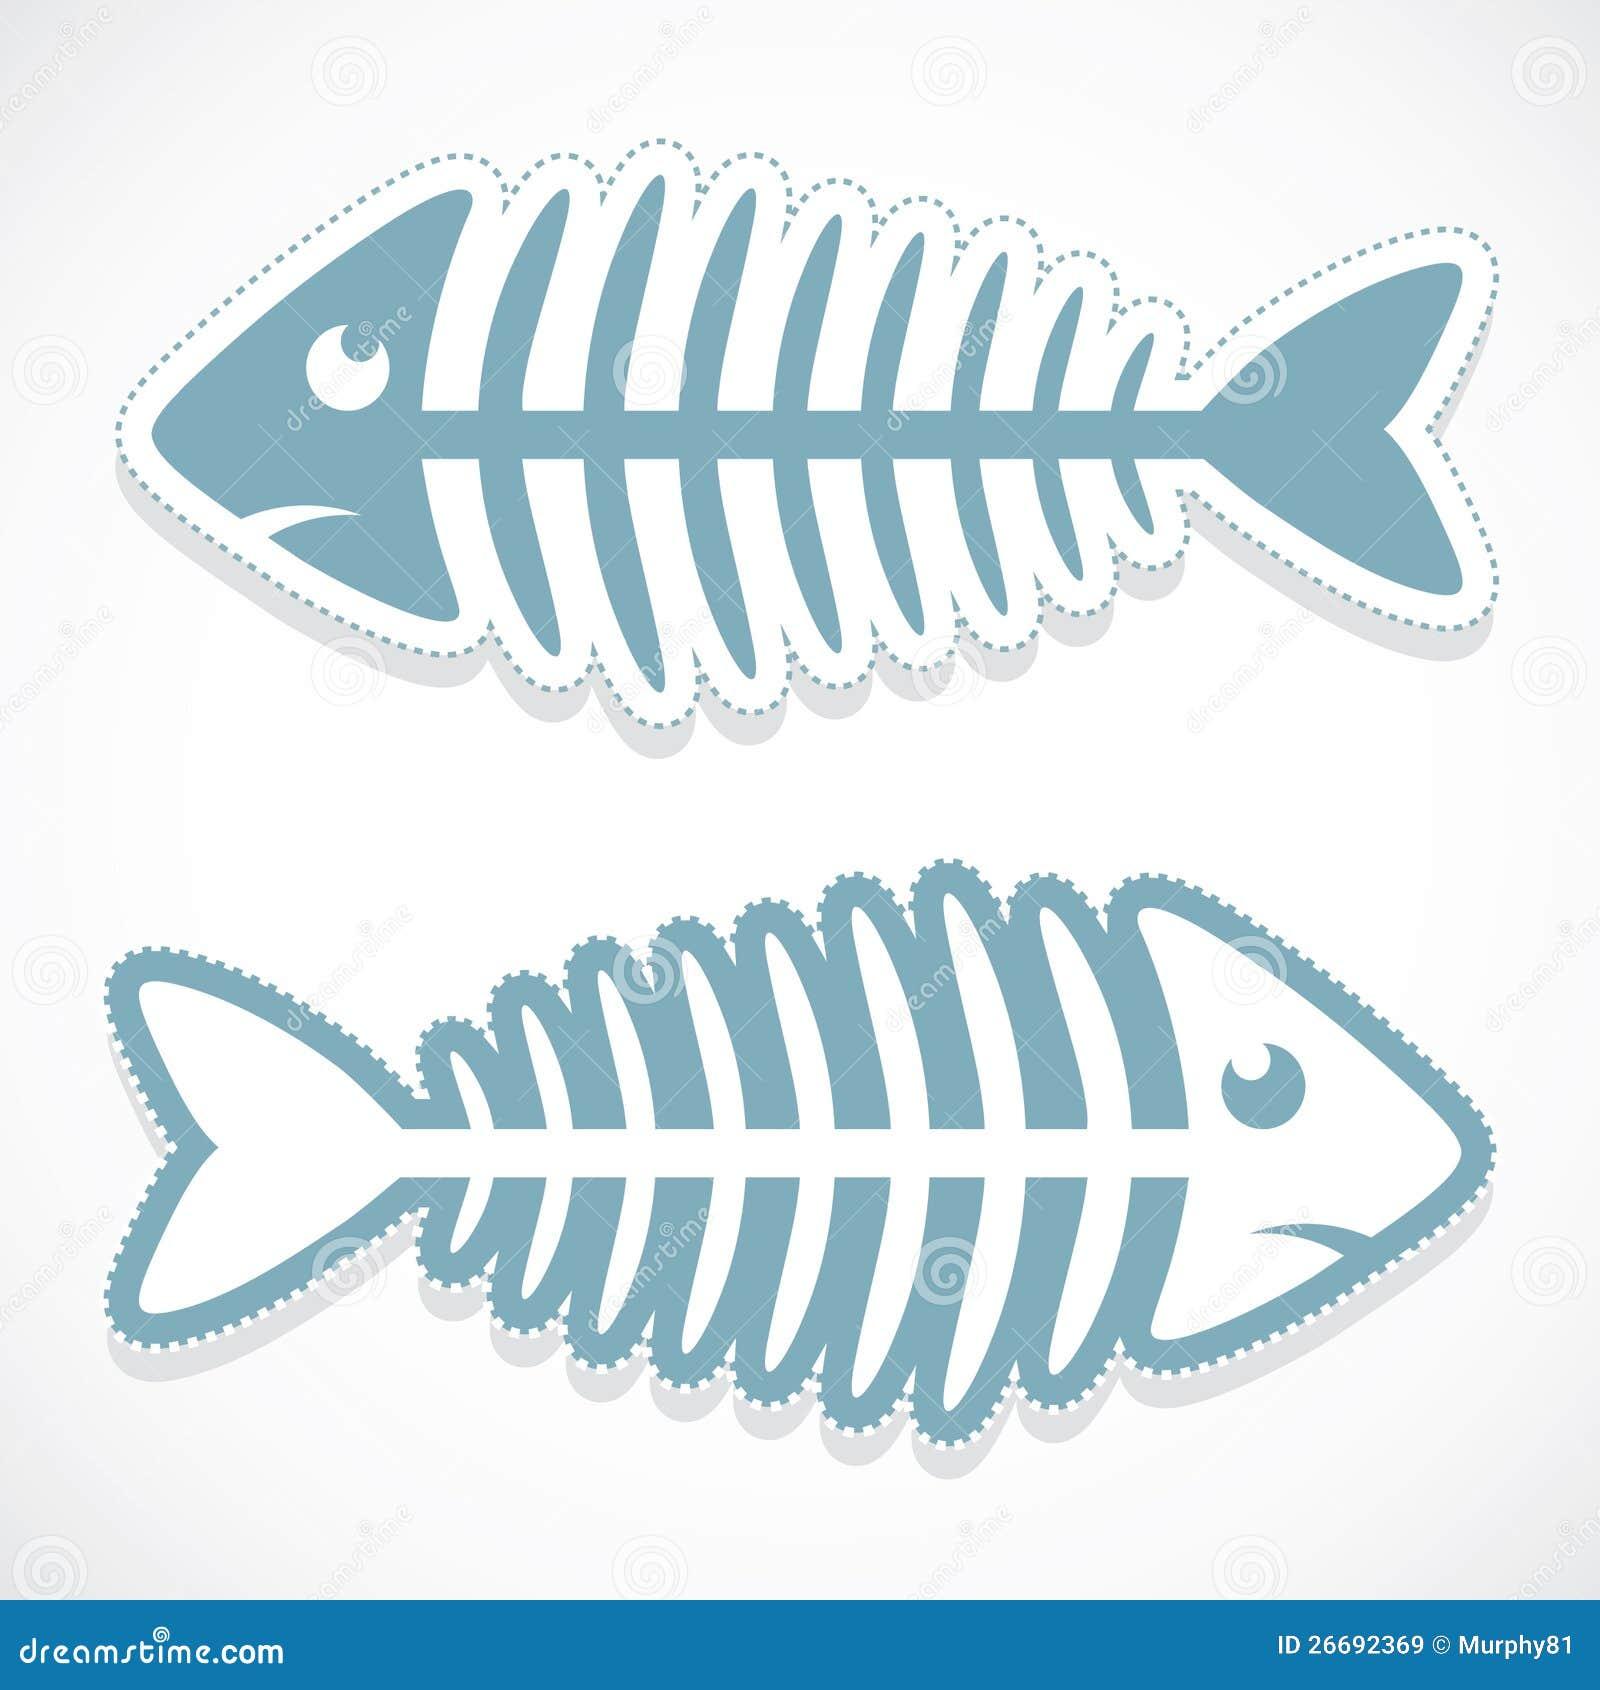 Fish Bone Clip Art Cartoon Stock Photos, Images, & Pictures - 77 ...